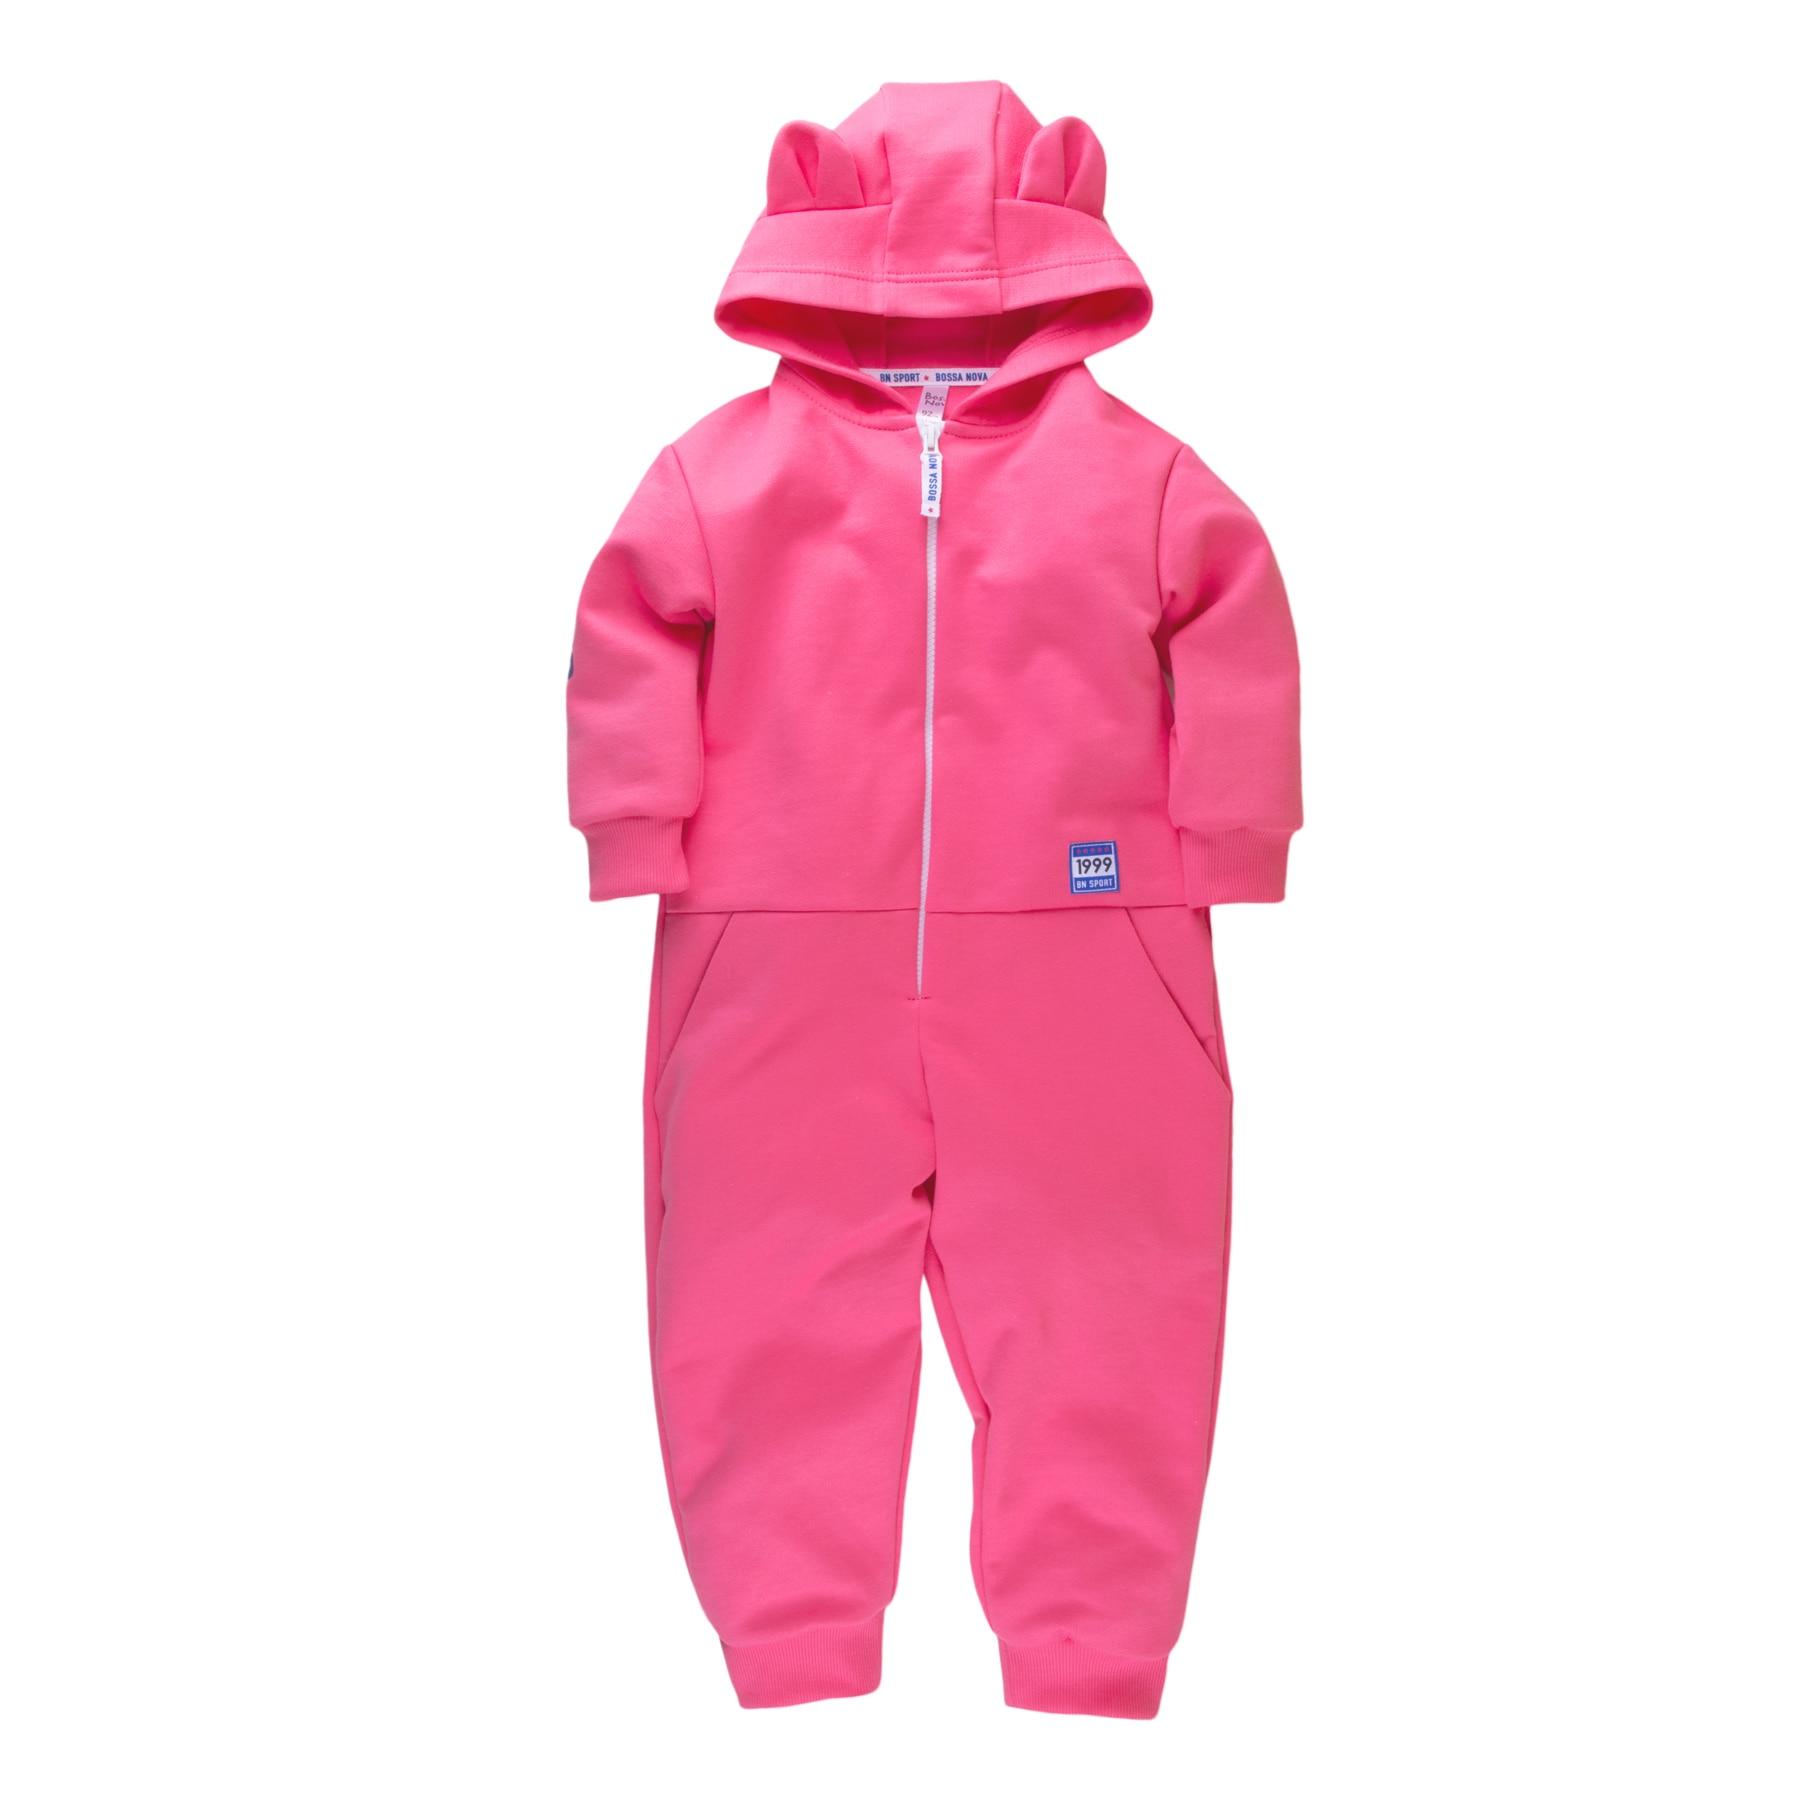 Hooded jumpsuit for girls BOSSA NOVA 500B-462p kid clothes newborn baby boy girl infant warm cotton outfit jumpsuit romper bodysuit clothes